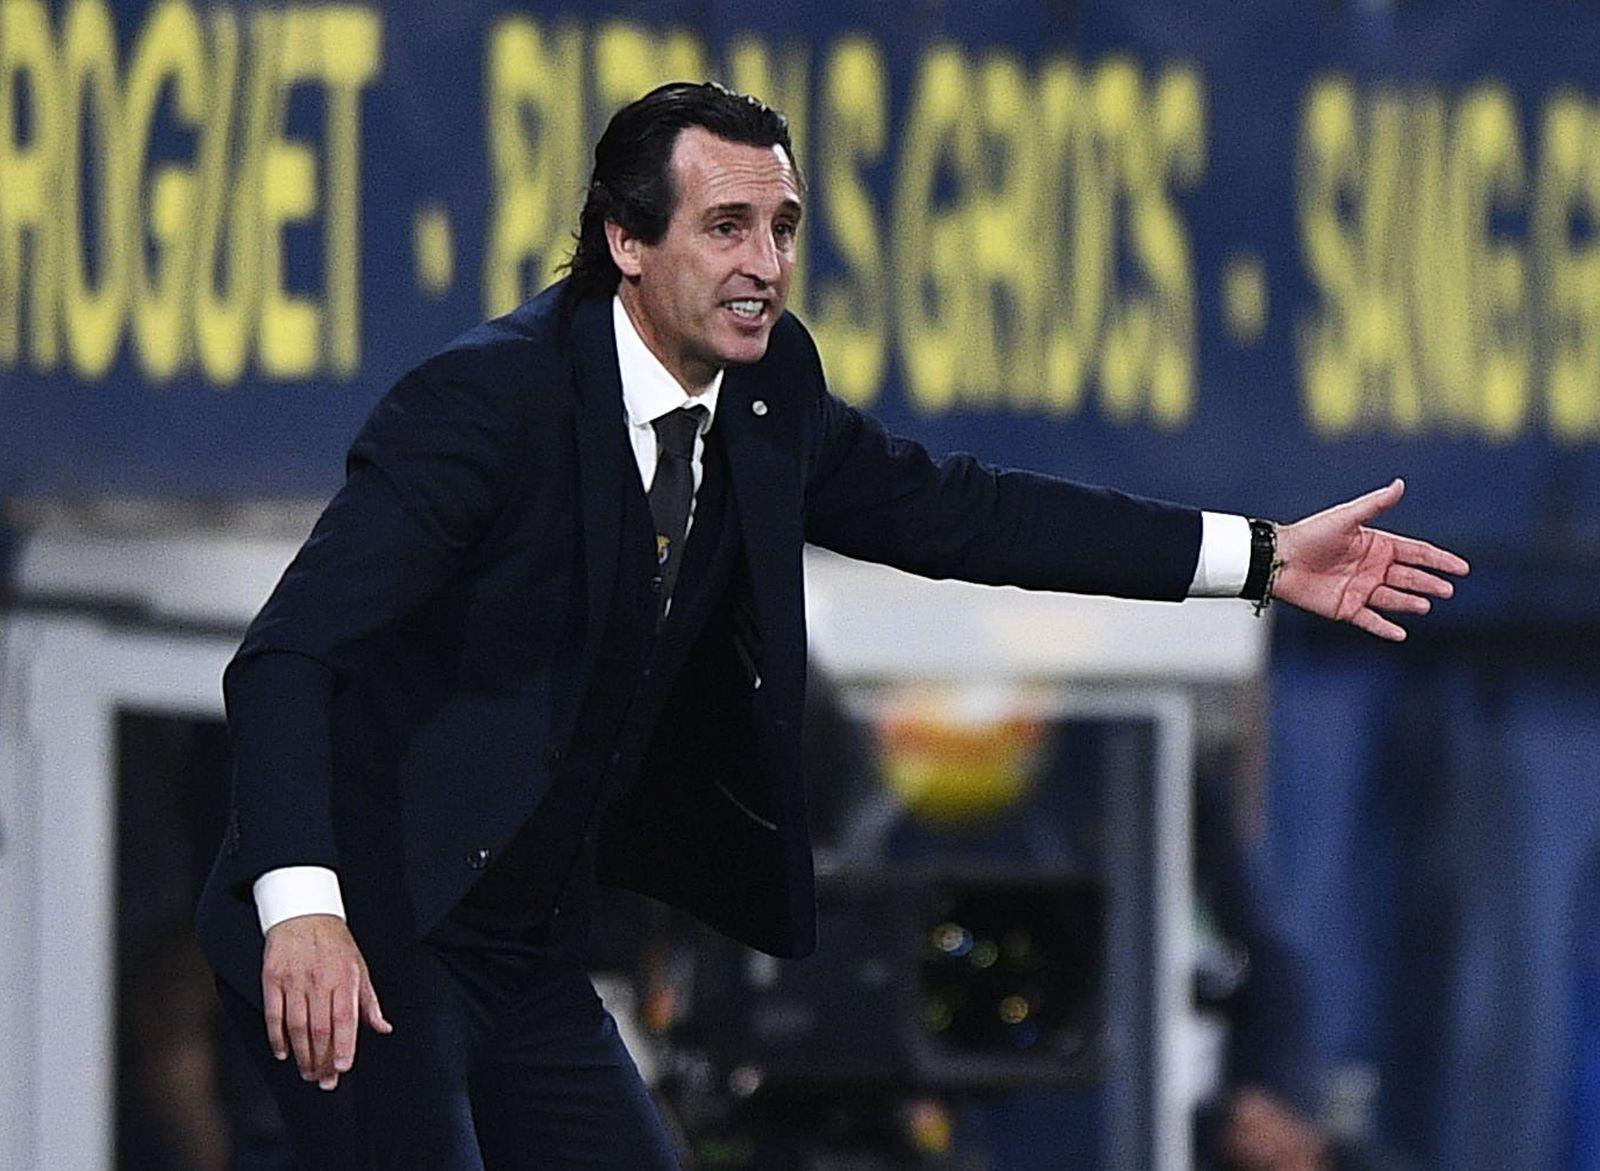 Europa League - Semi Final First Leg - Villarreal v Arsenal